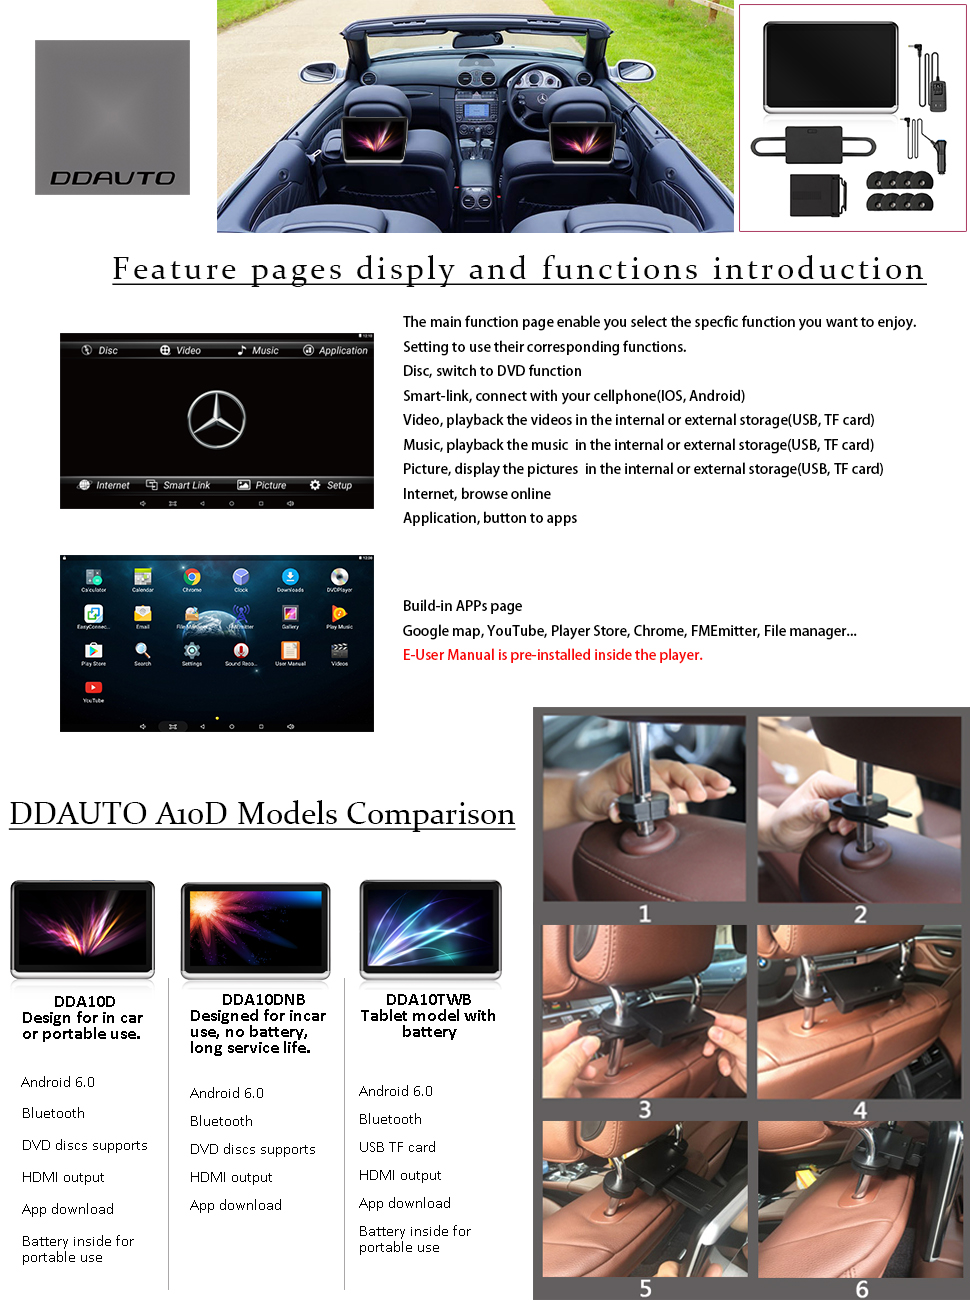 Amazon.com: DDAUTO DDA10D Tablet Android 6.0 Portable DVD Player ...